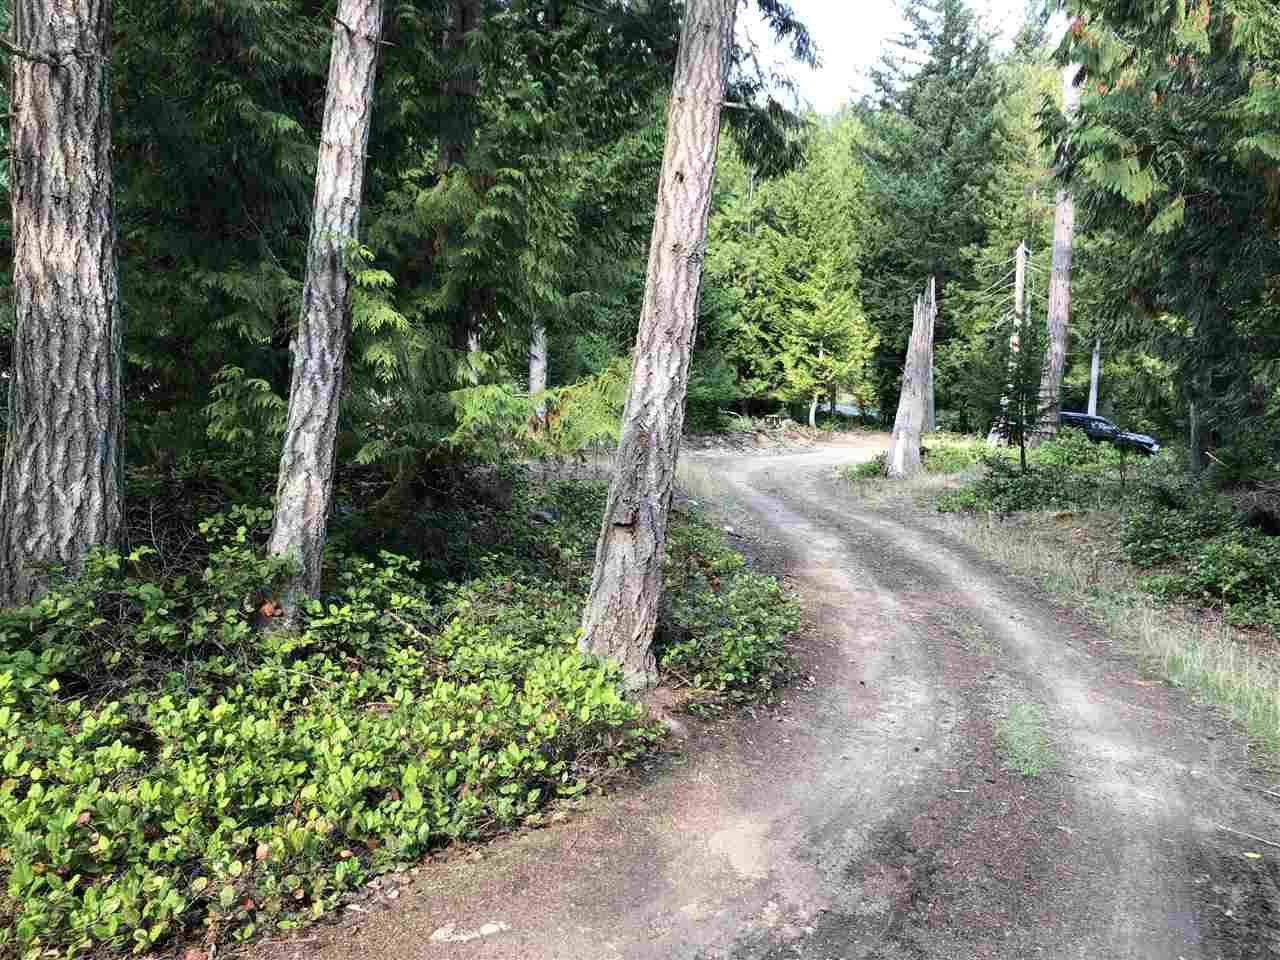 Main Photo: 555 GLEN ECHO Road: Mayne Island Land for sale (Islands-Van. & Gulf)  : MLS®# R2501115